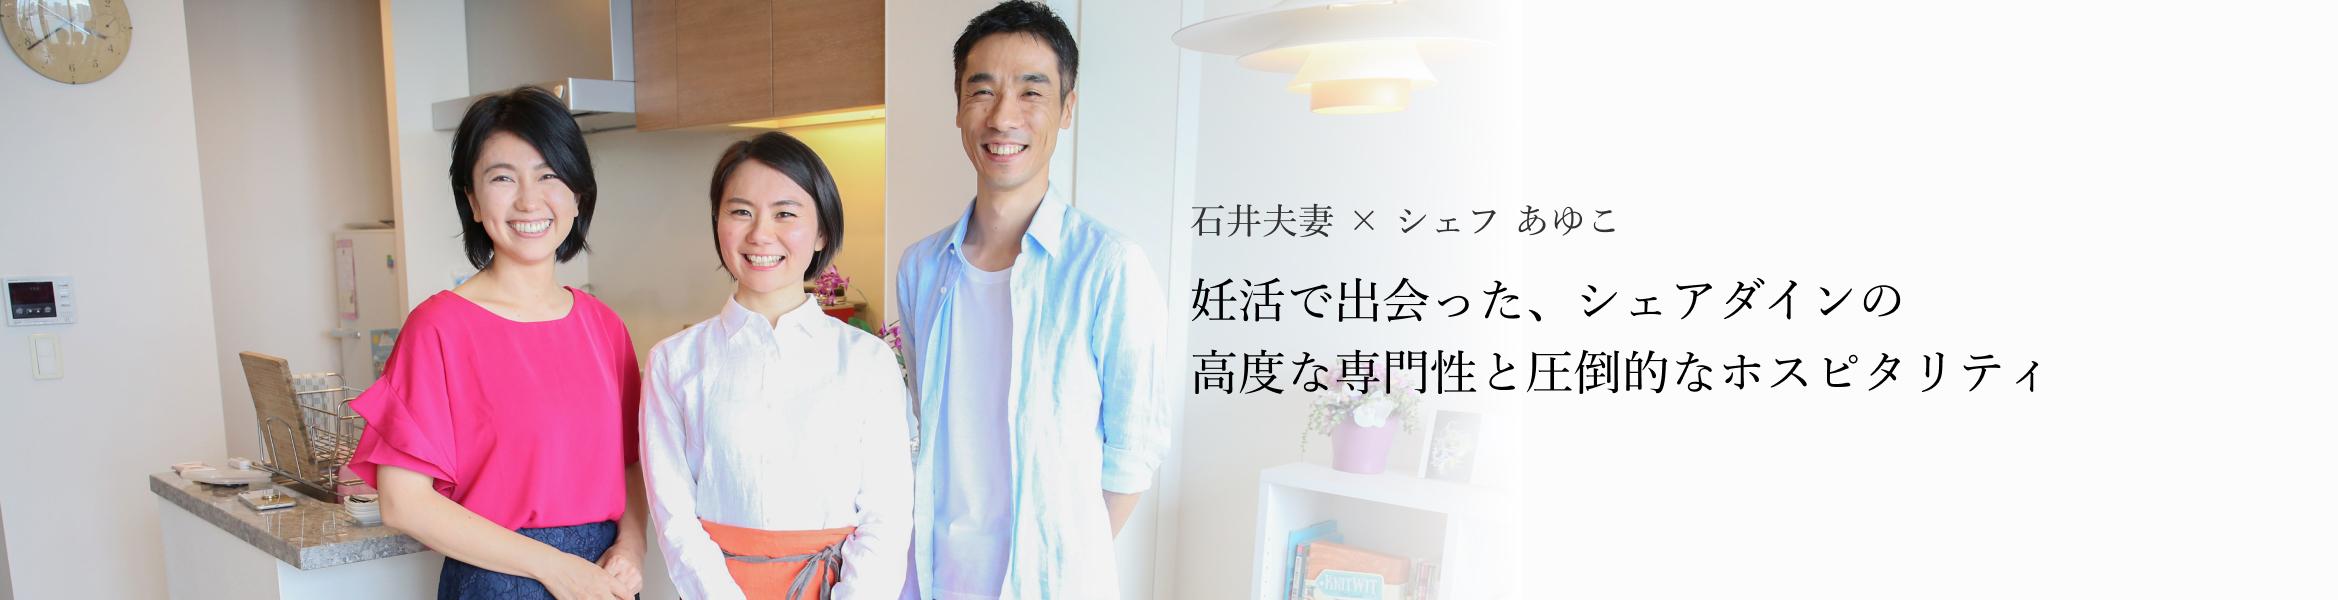 Interview banner 1 pc